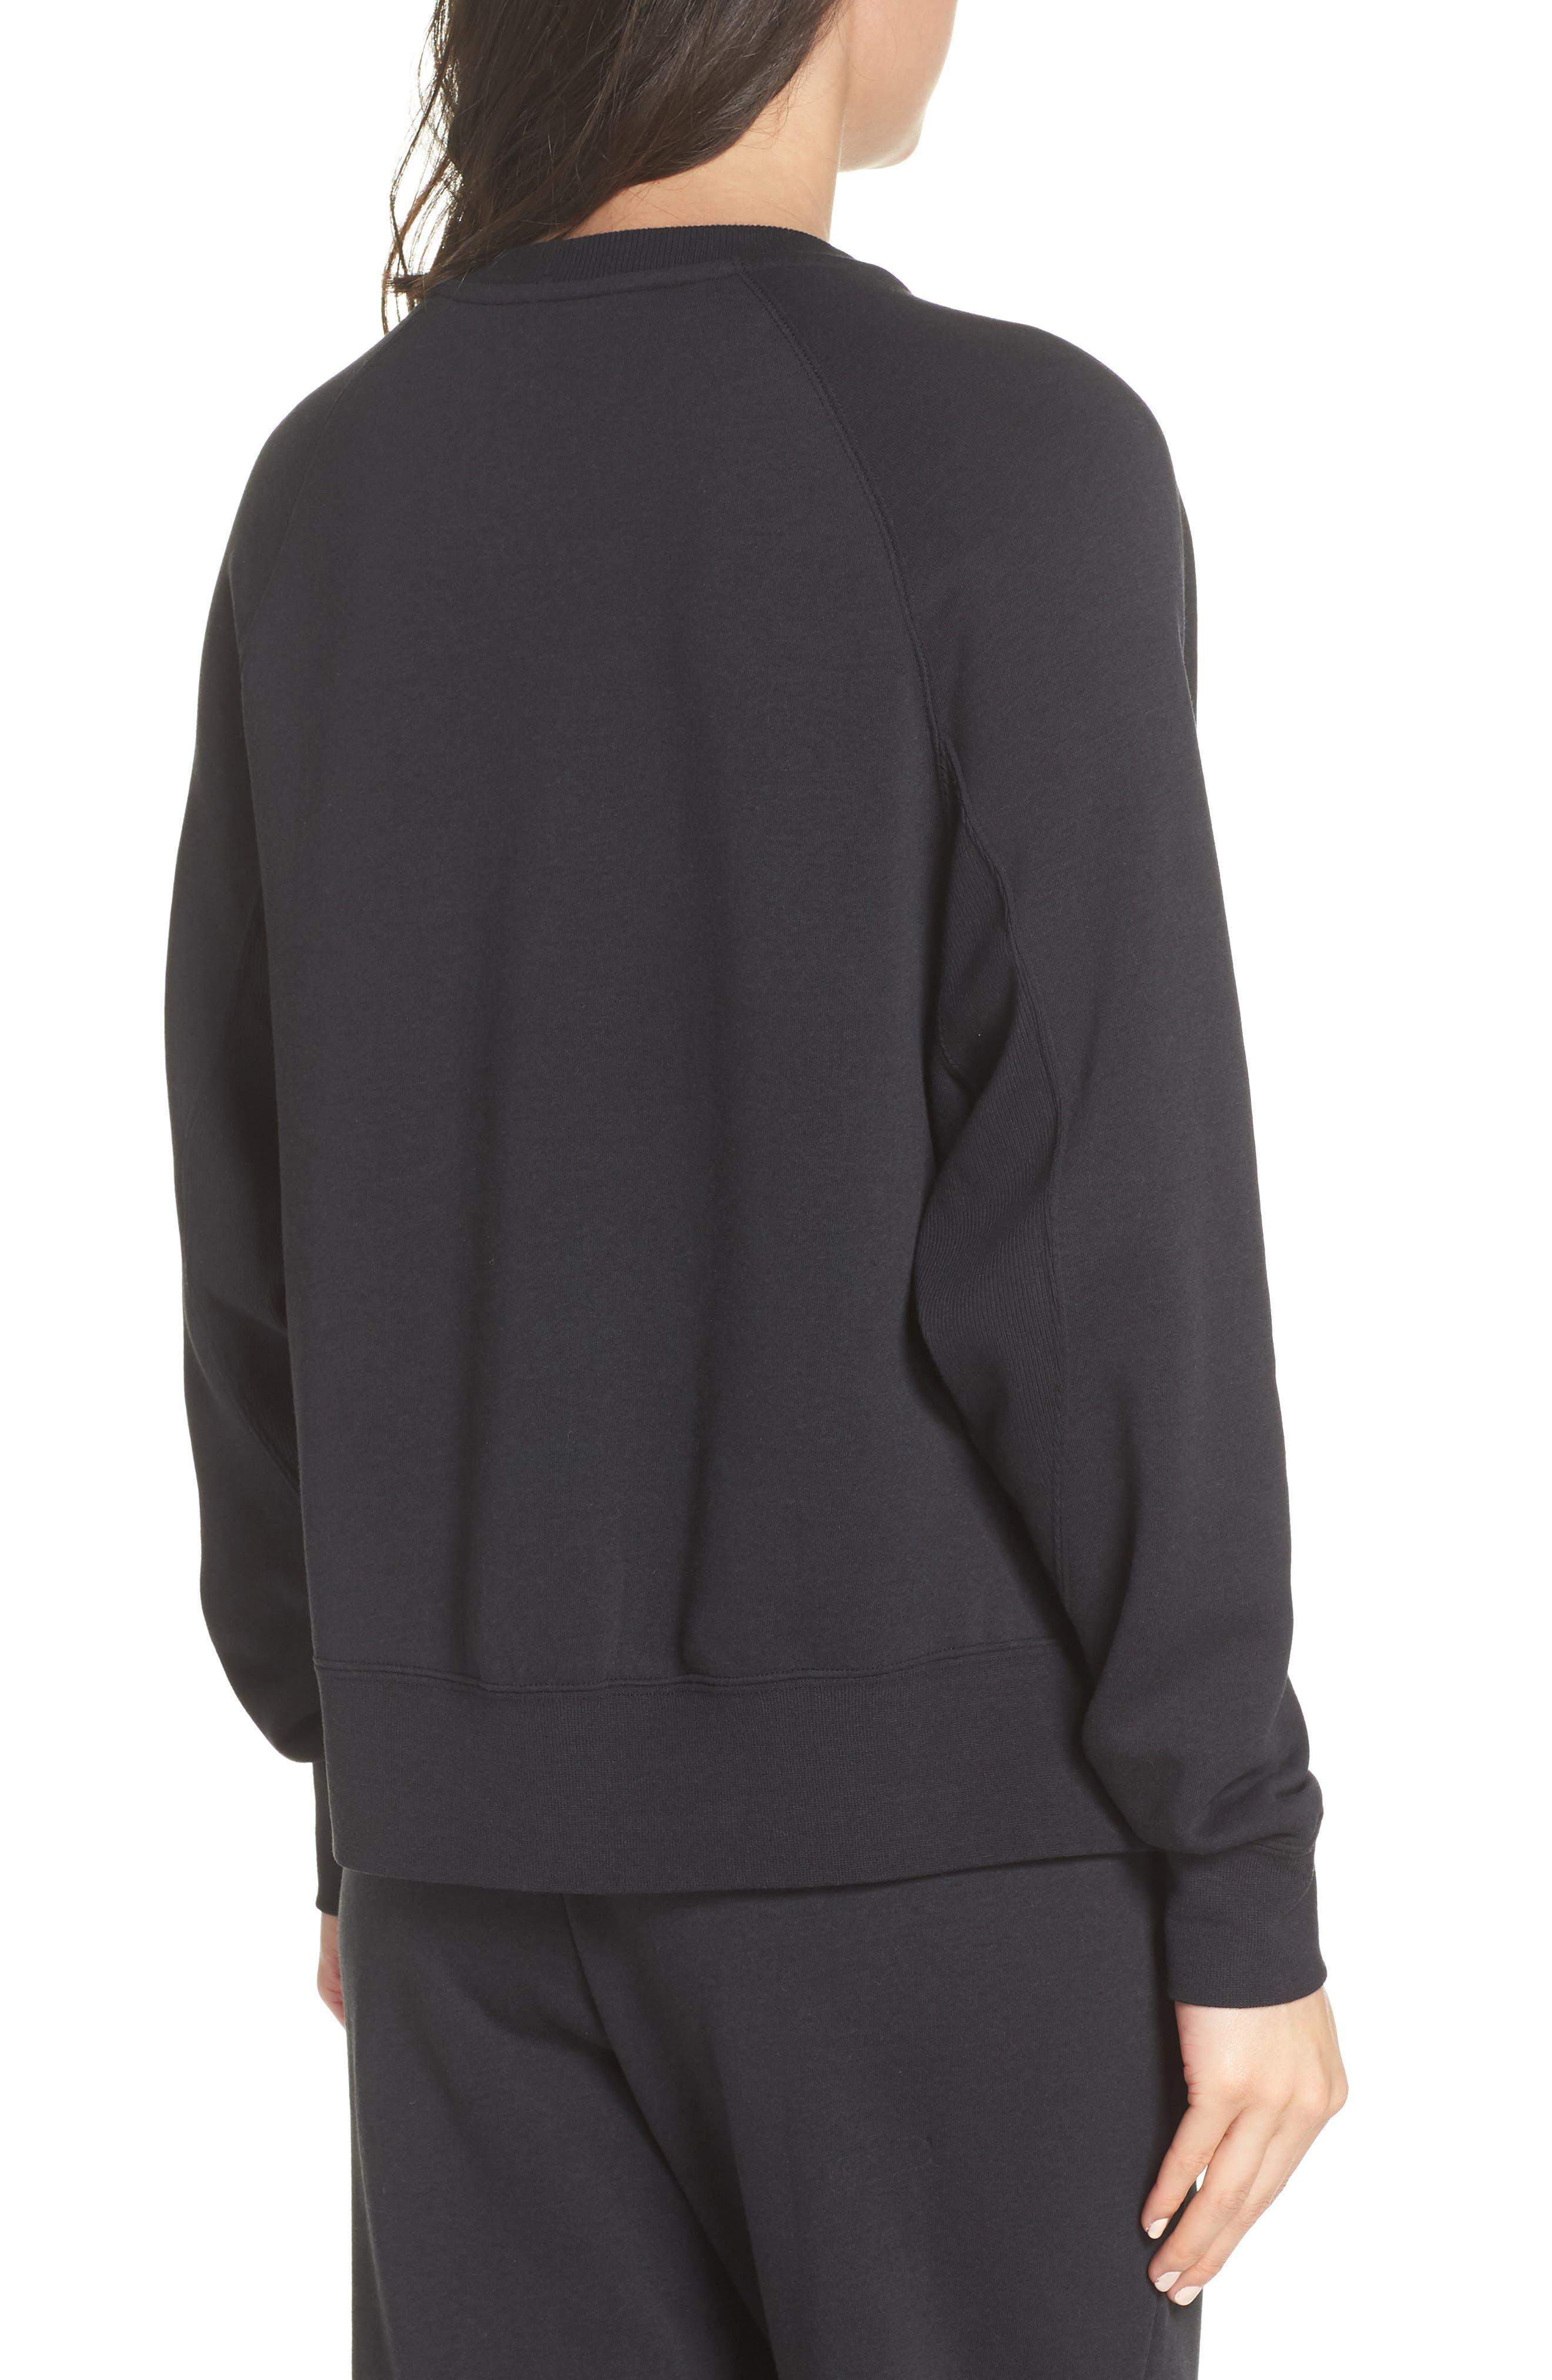 Sportswear Rally Sweatshirt,                             Alternate thumbnail 2, color,                             Black/ White